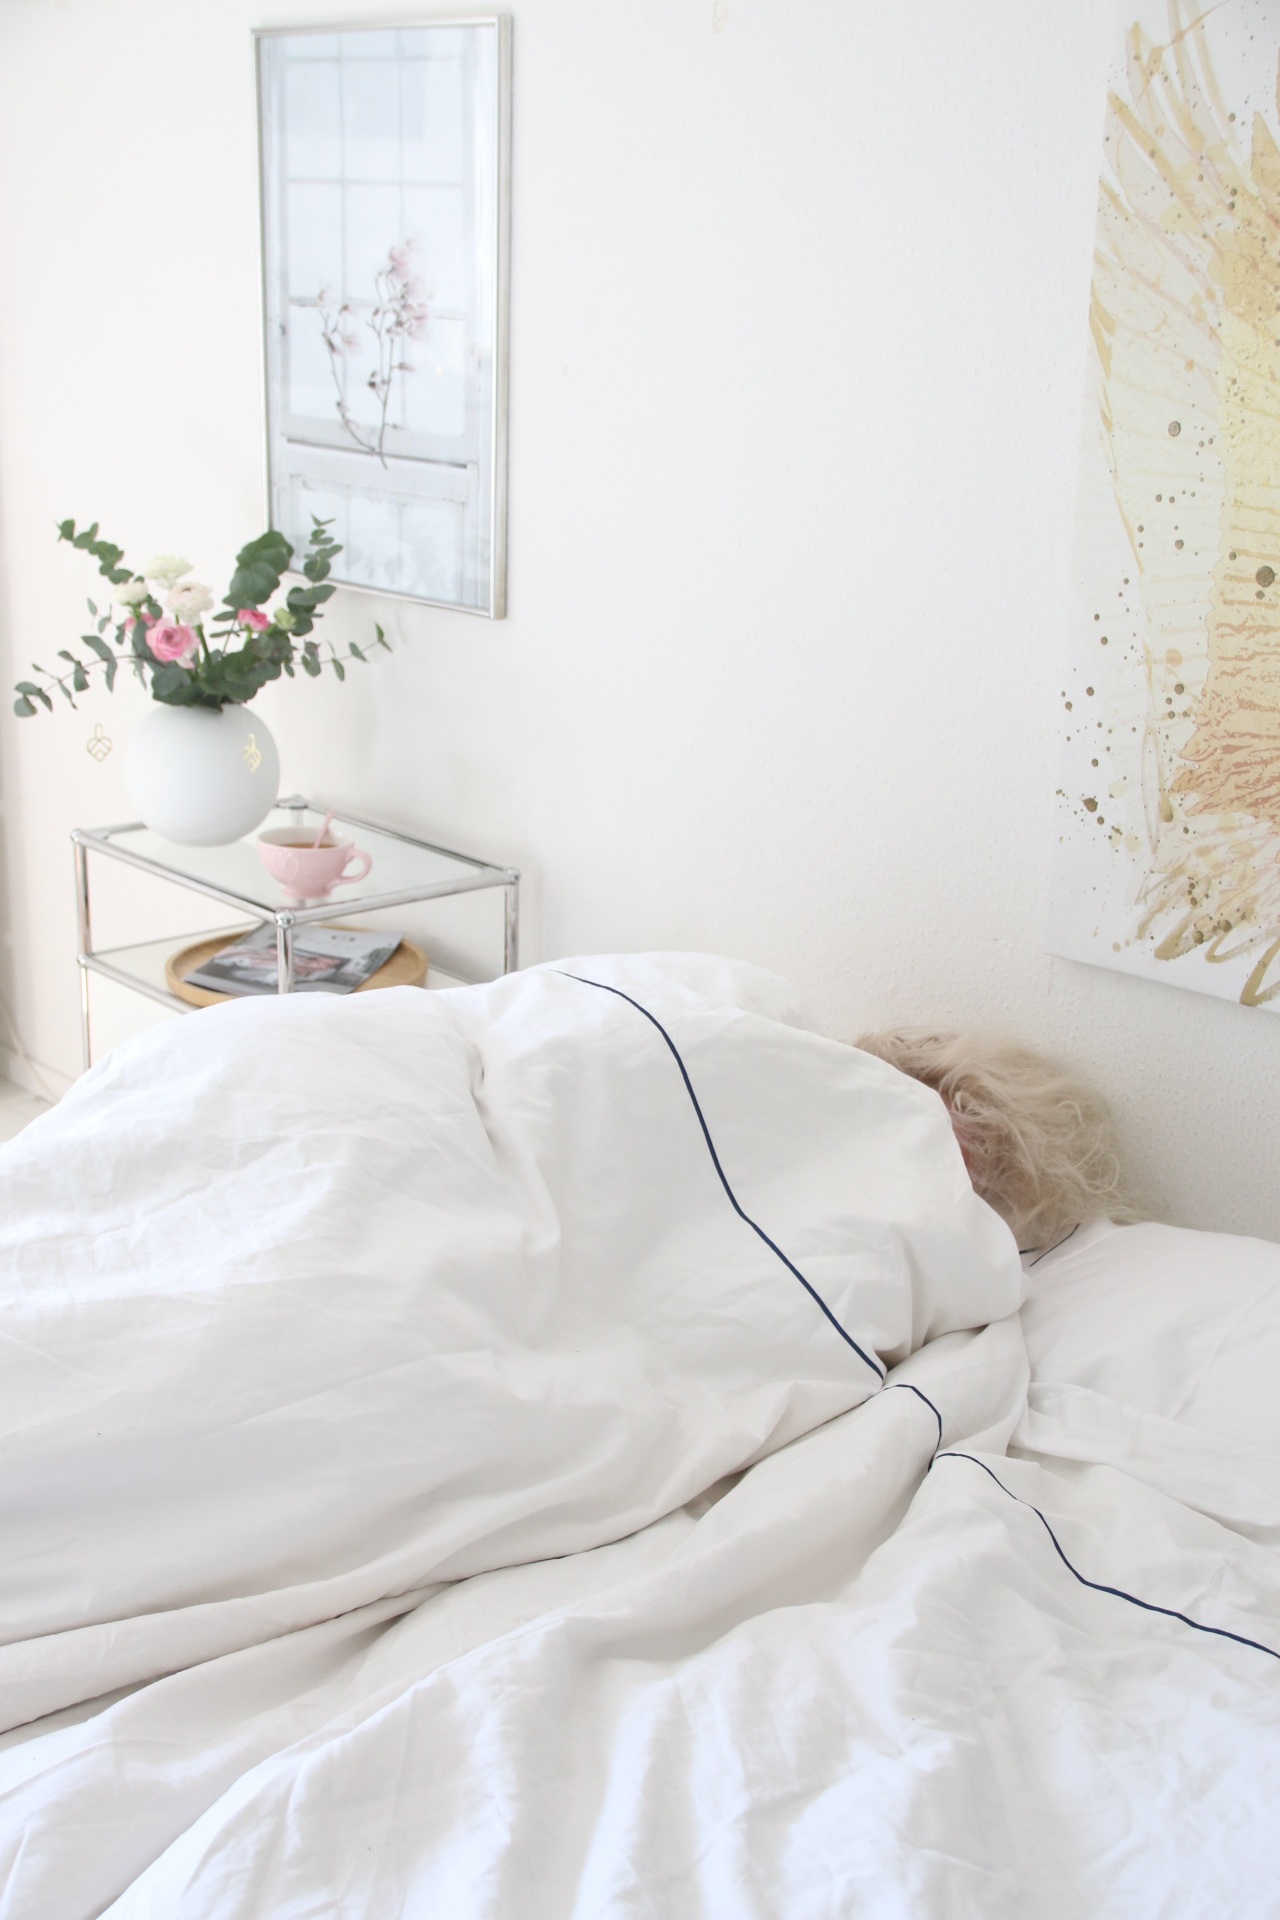 My Luxury Linen Always and much; sleep routines with Sabine1.JPG